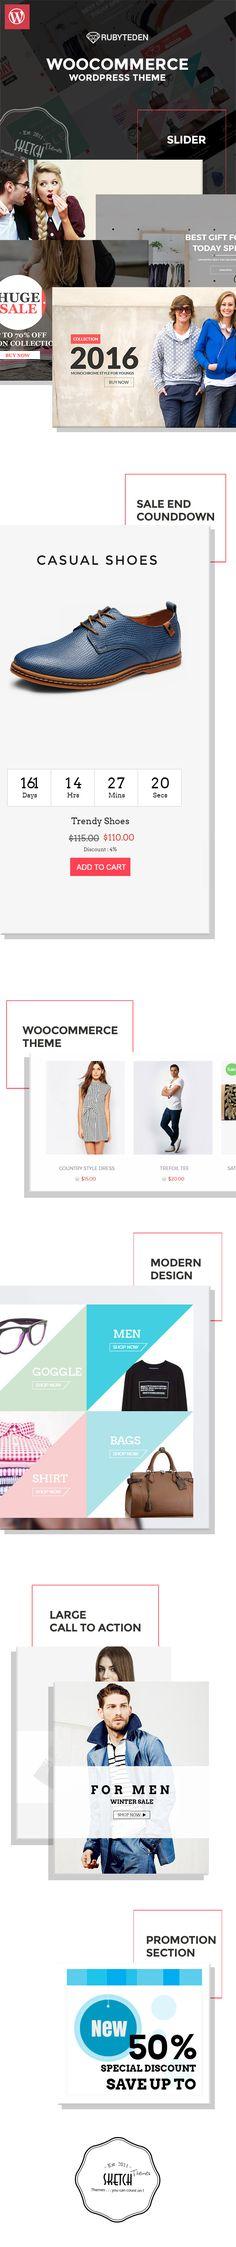 RubyTeden - Responsive WooCommerce Shopfront Theme #Wordpress • Download theme ➝ https://themeforest.net/item/rubyteden-responsive-woocommerce-shopfront-theme/12722119?ref=pxcr